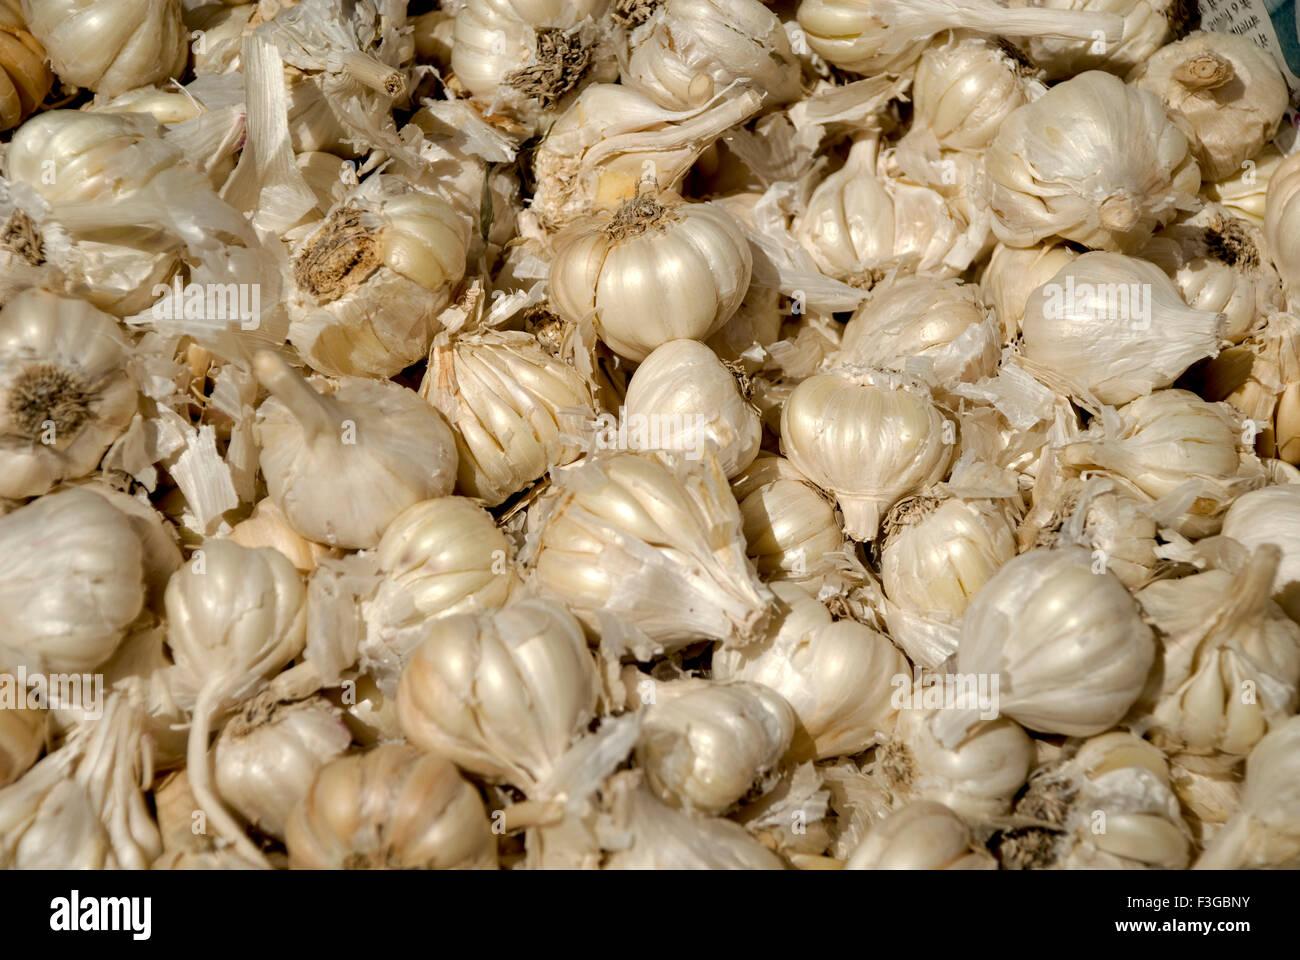 Spices ; garlic vegetable at Kalpa ; Himachal Pradesh ; India - Stock Image